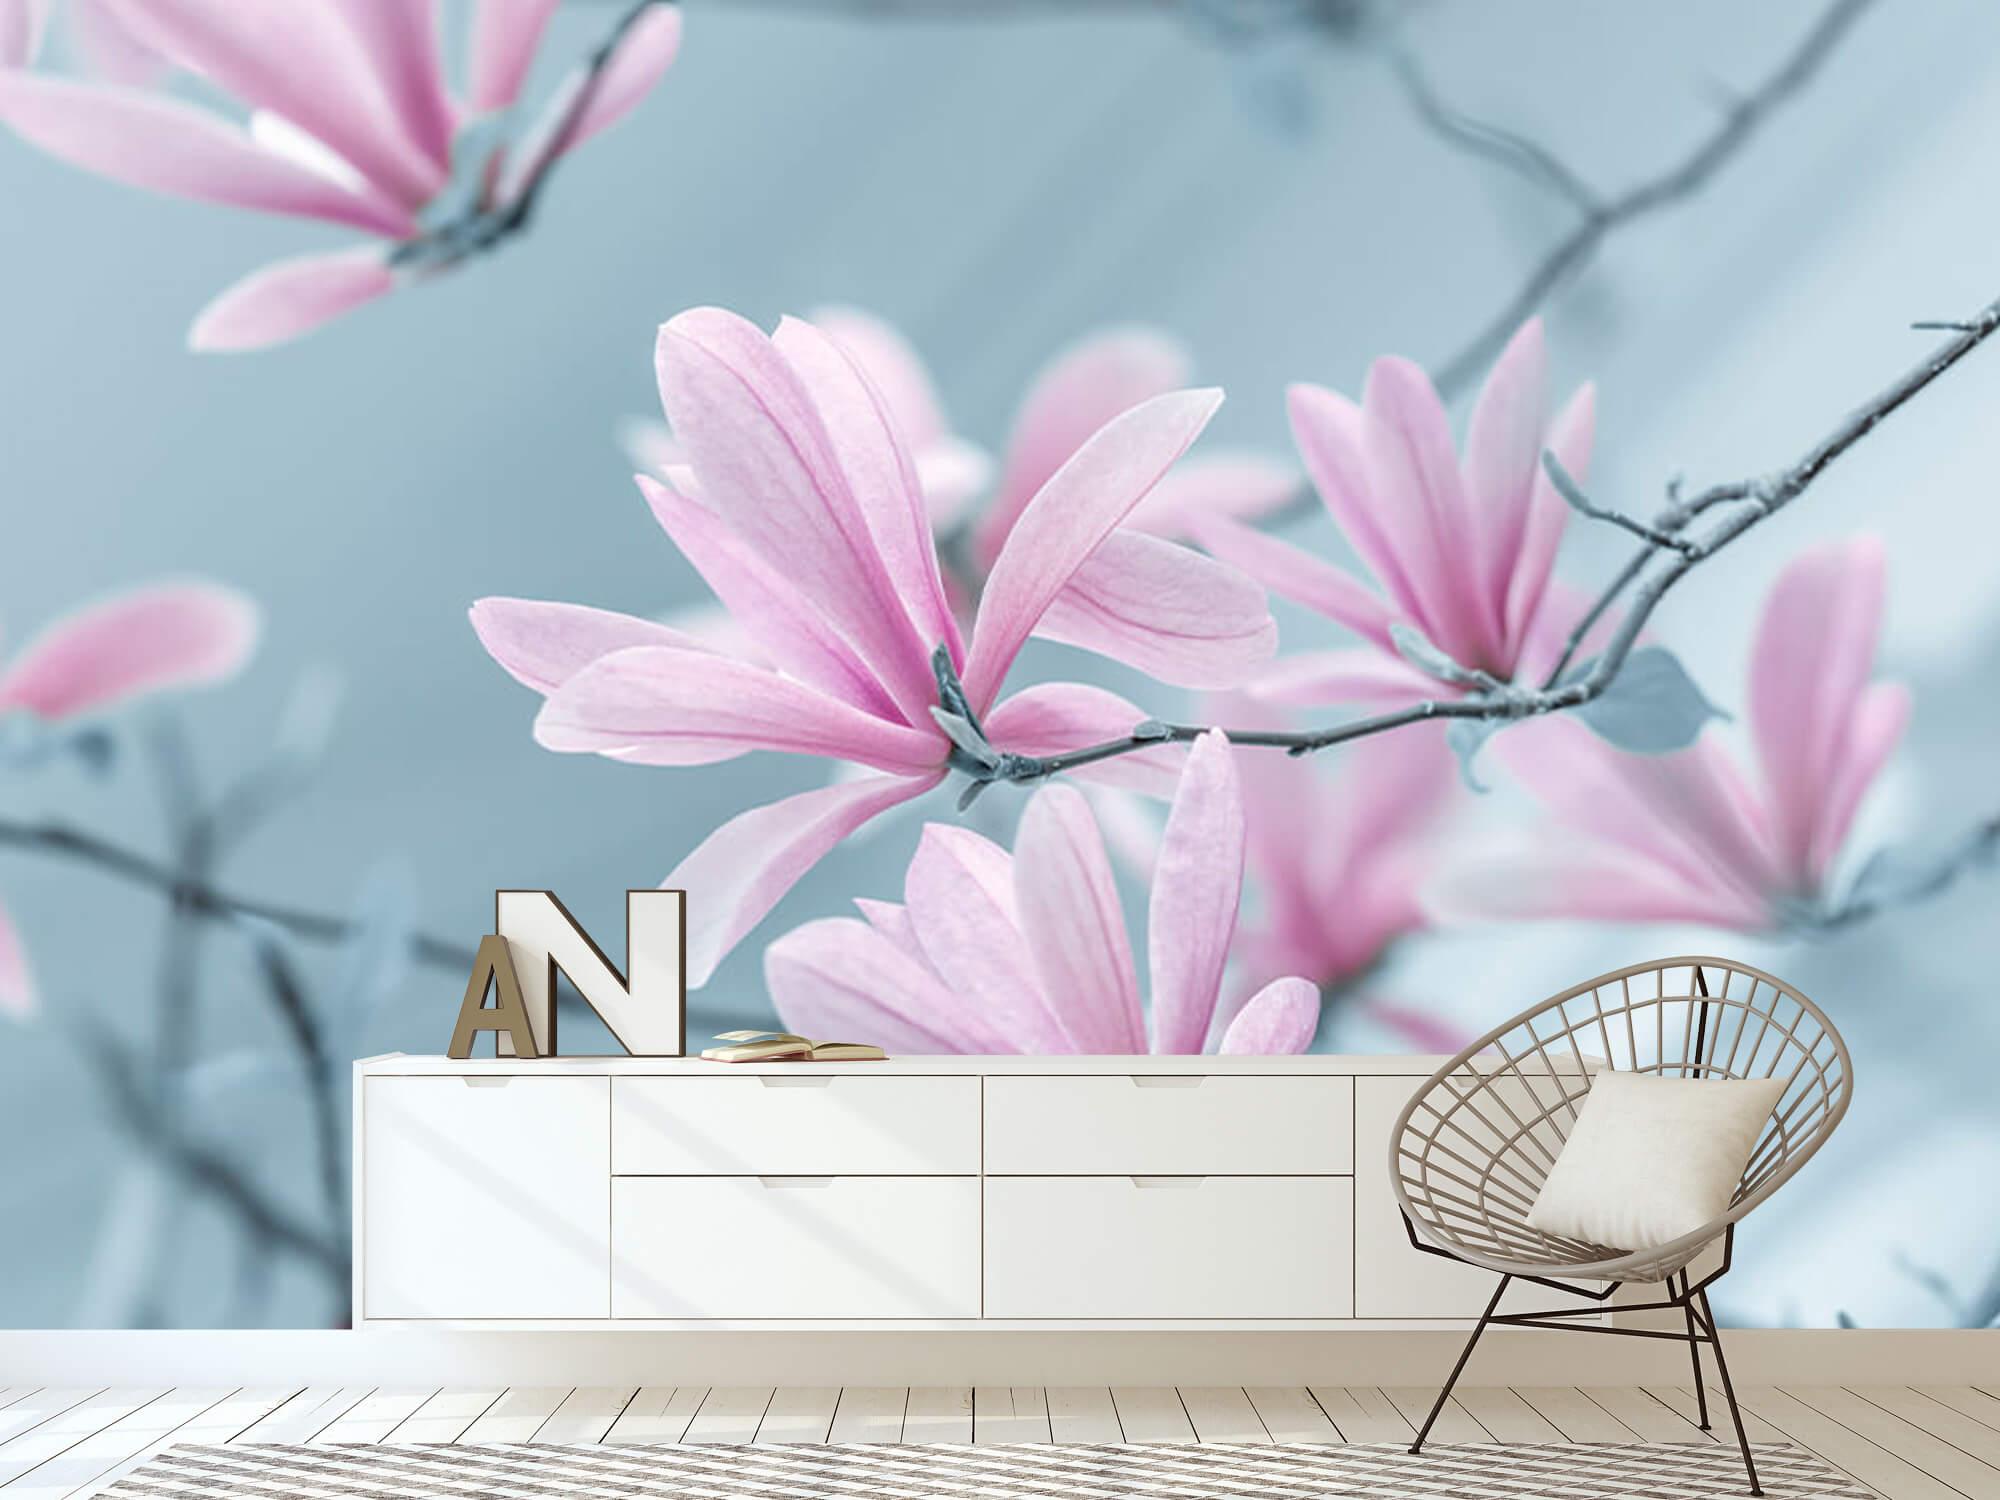 Magnolia bloemen 16